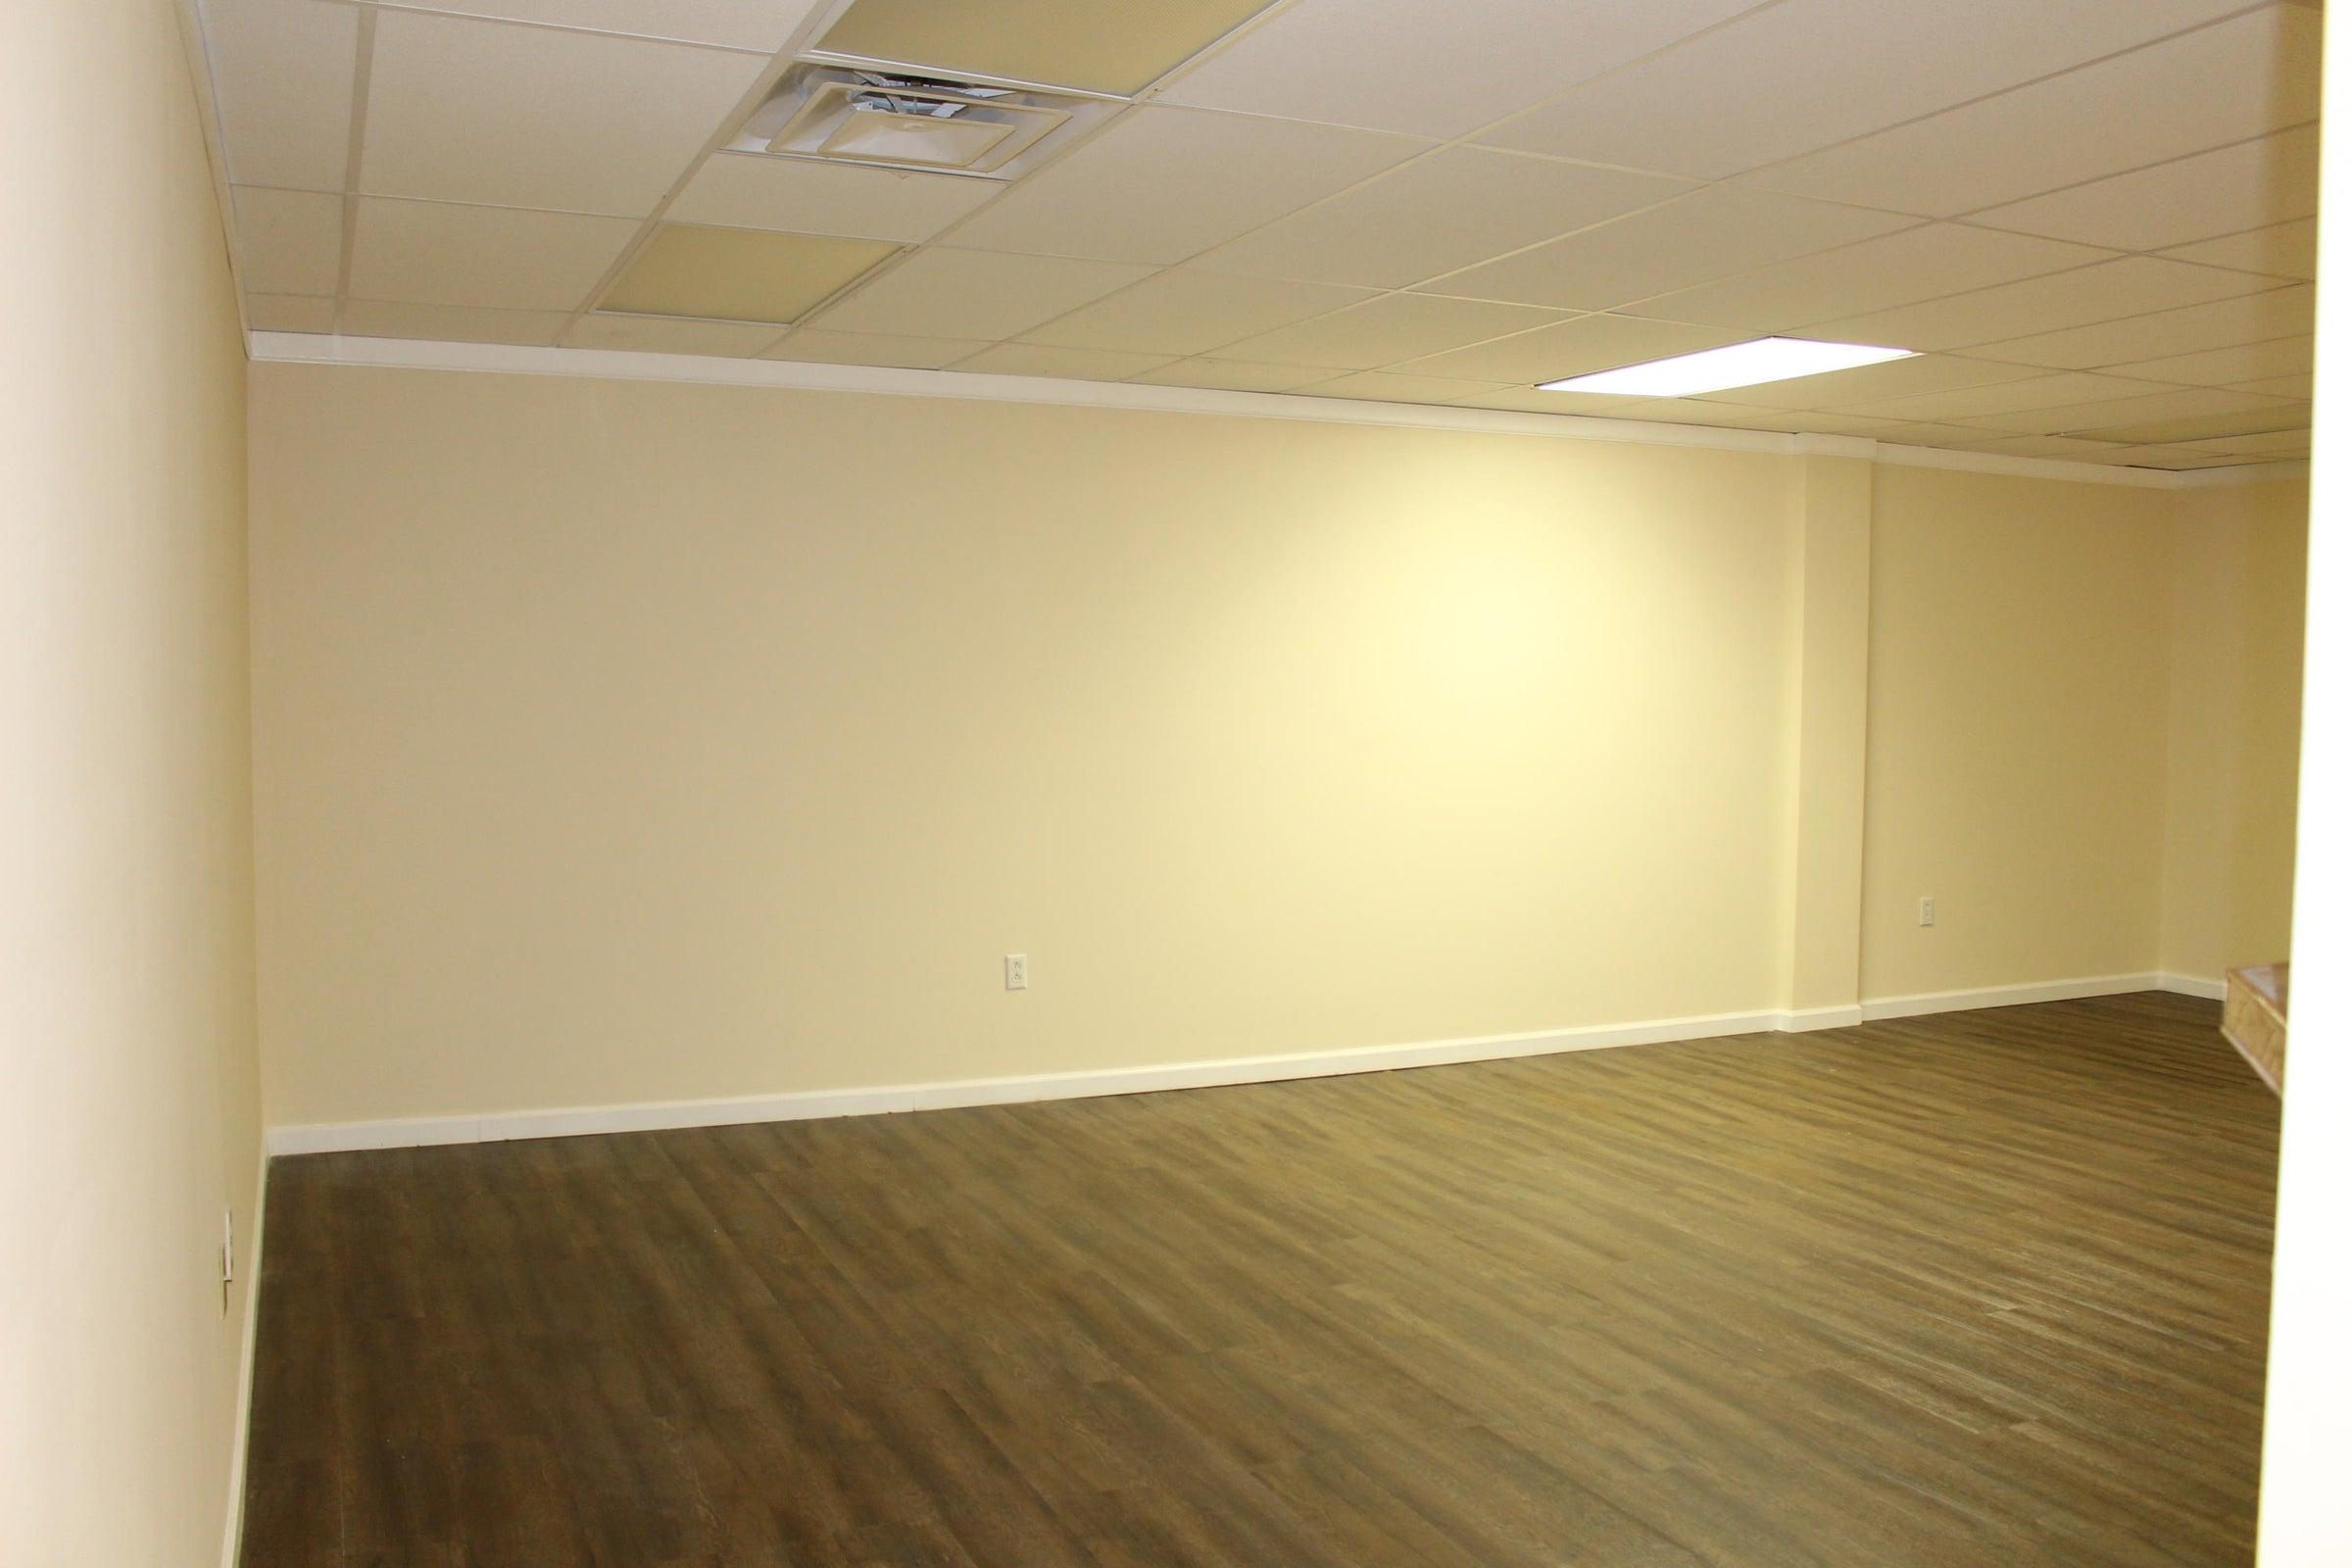 Rec Room Brand New Flooring in Basement